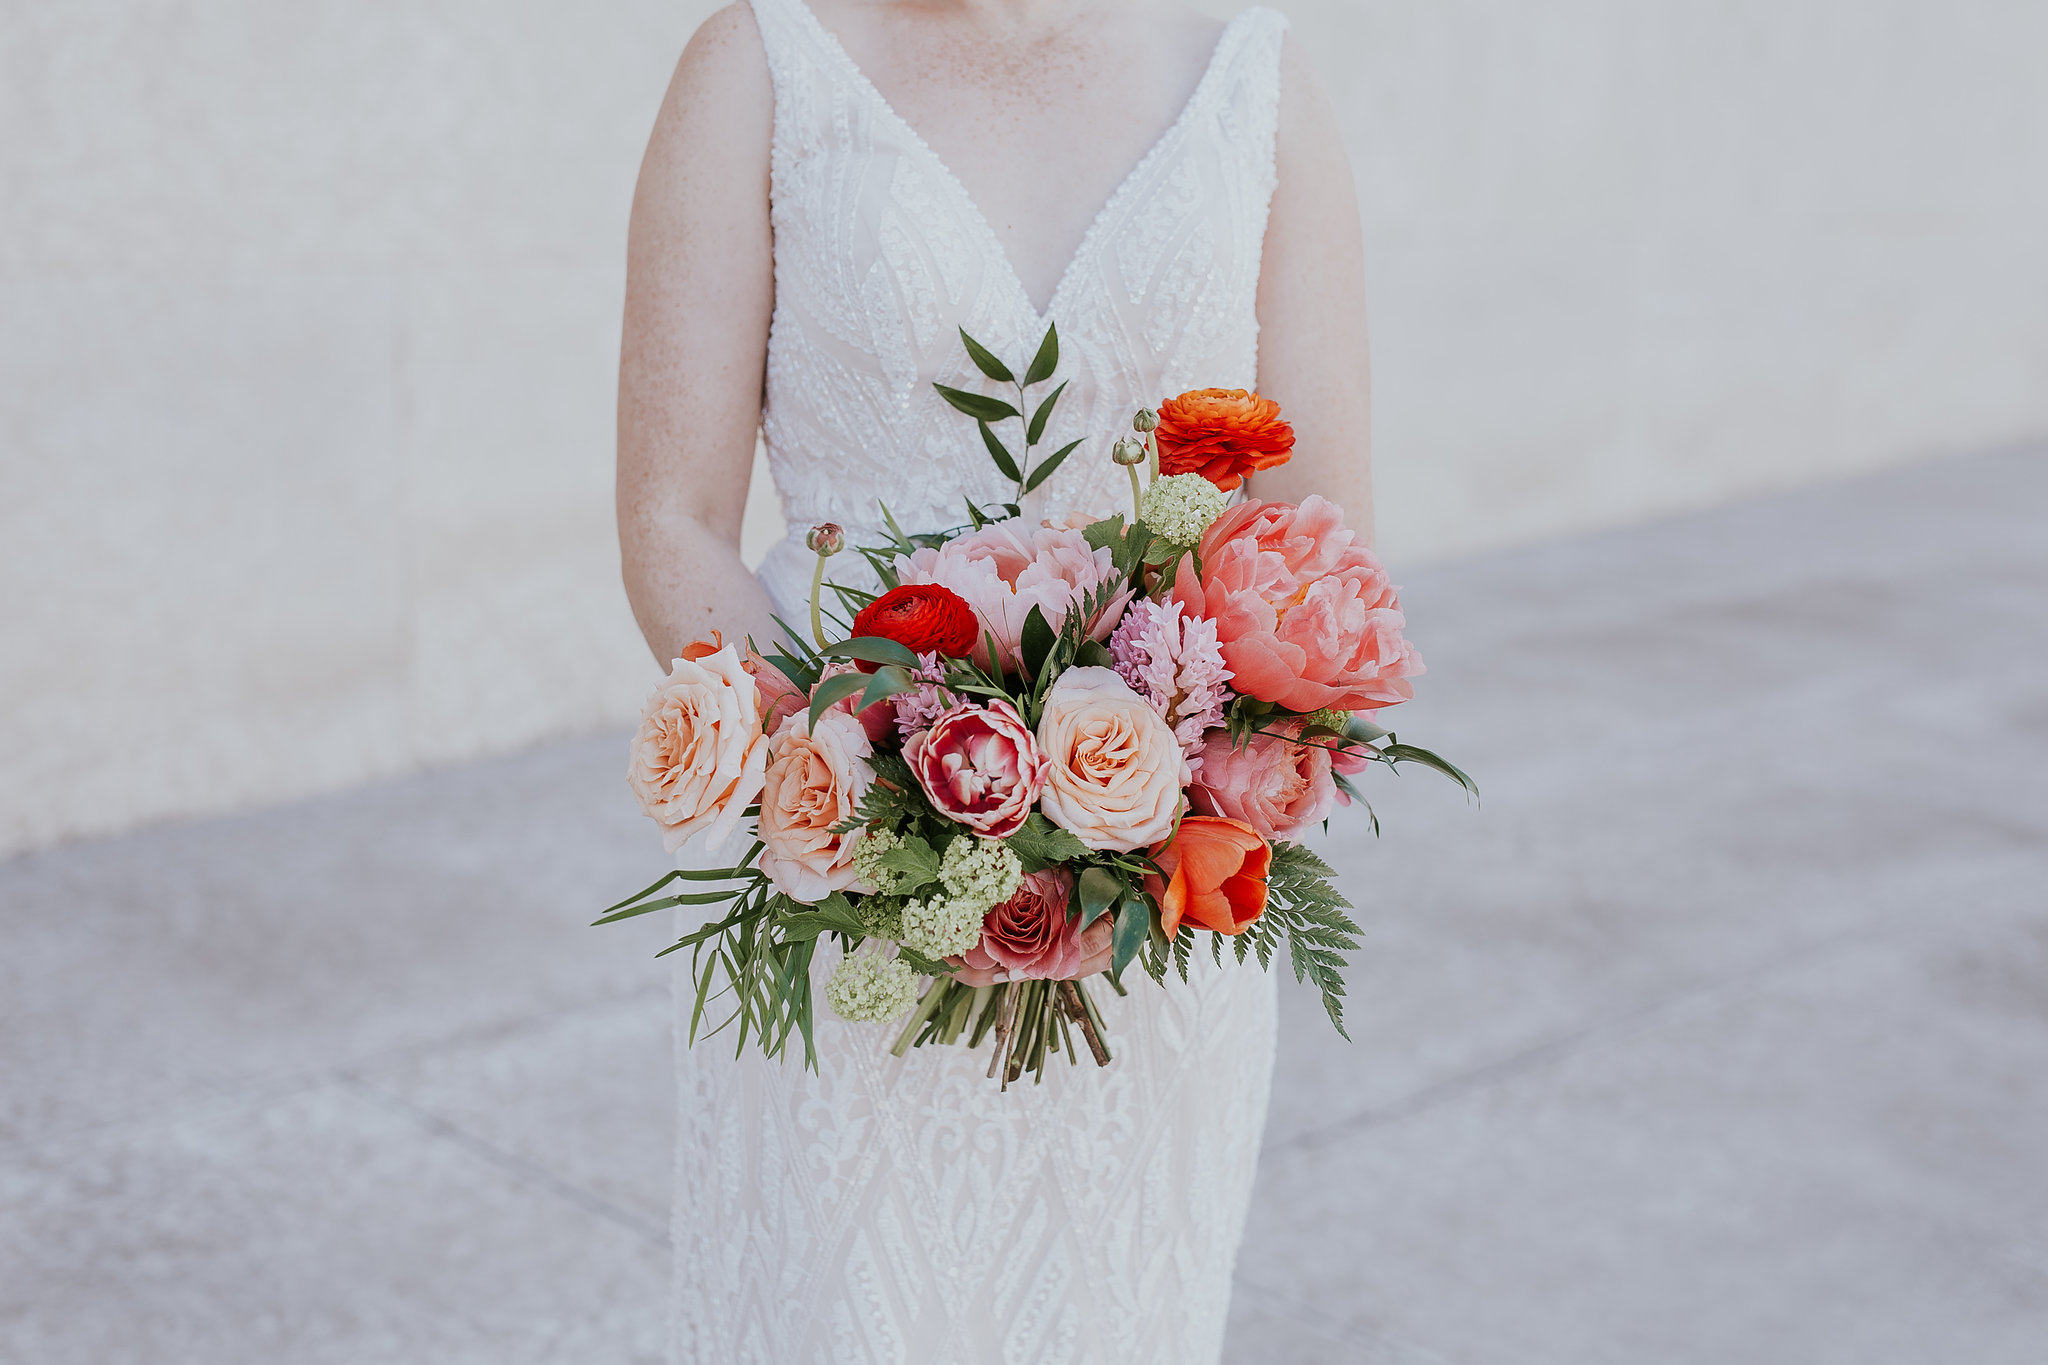 Vibrant Spring Wedding Bouquet - Stone House Creative